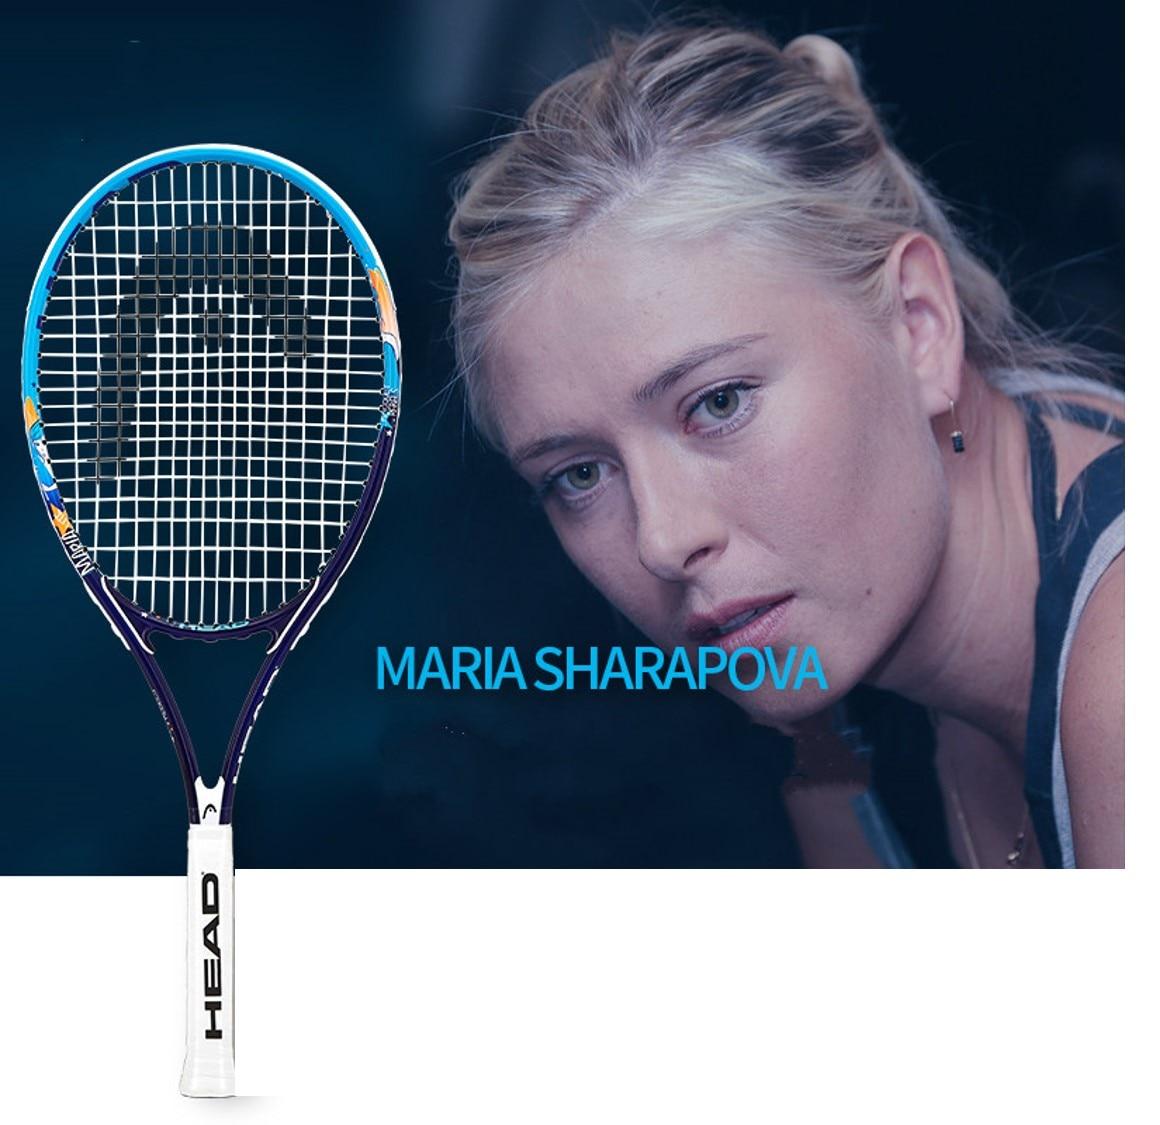 Tennis Head Women Tennis Racket Sharapova Raquete De Tennis Carbon Aluminum Fiber Top Material Tennis String 8 Colors L1 L2 Comfortable And Easy To Wear